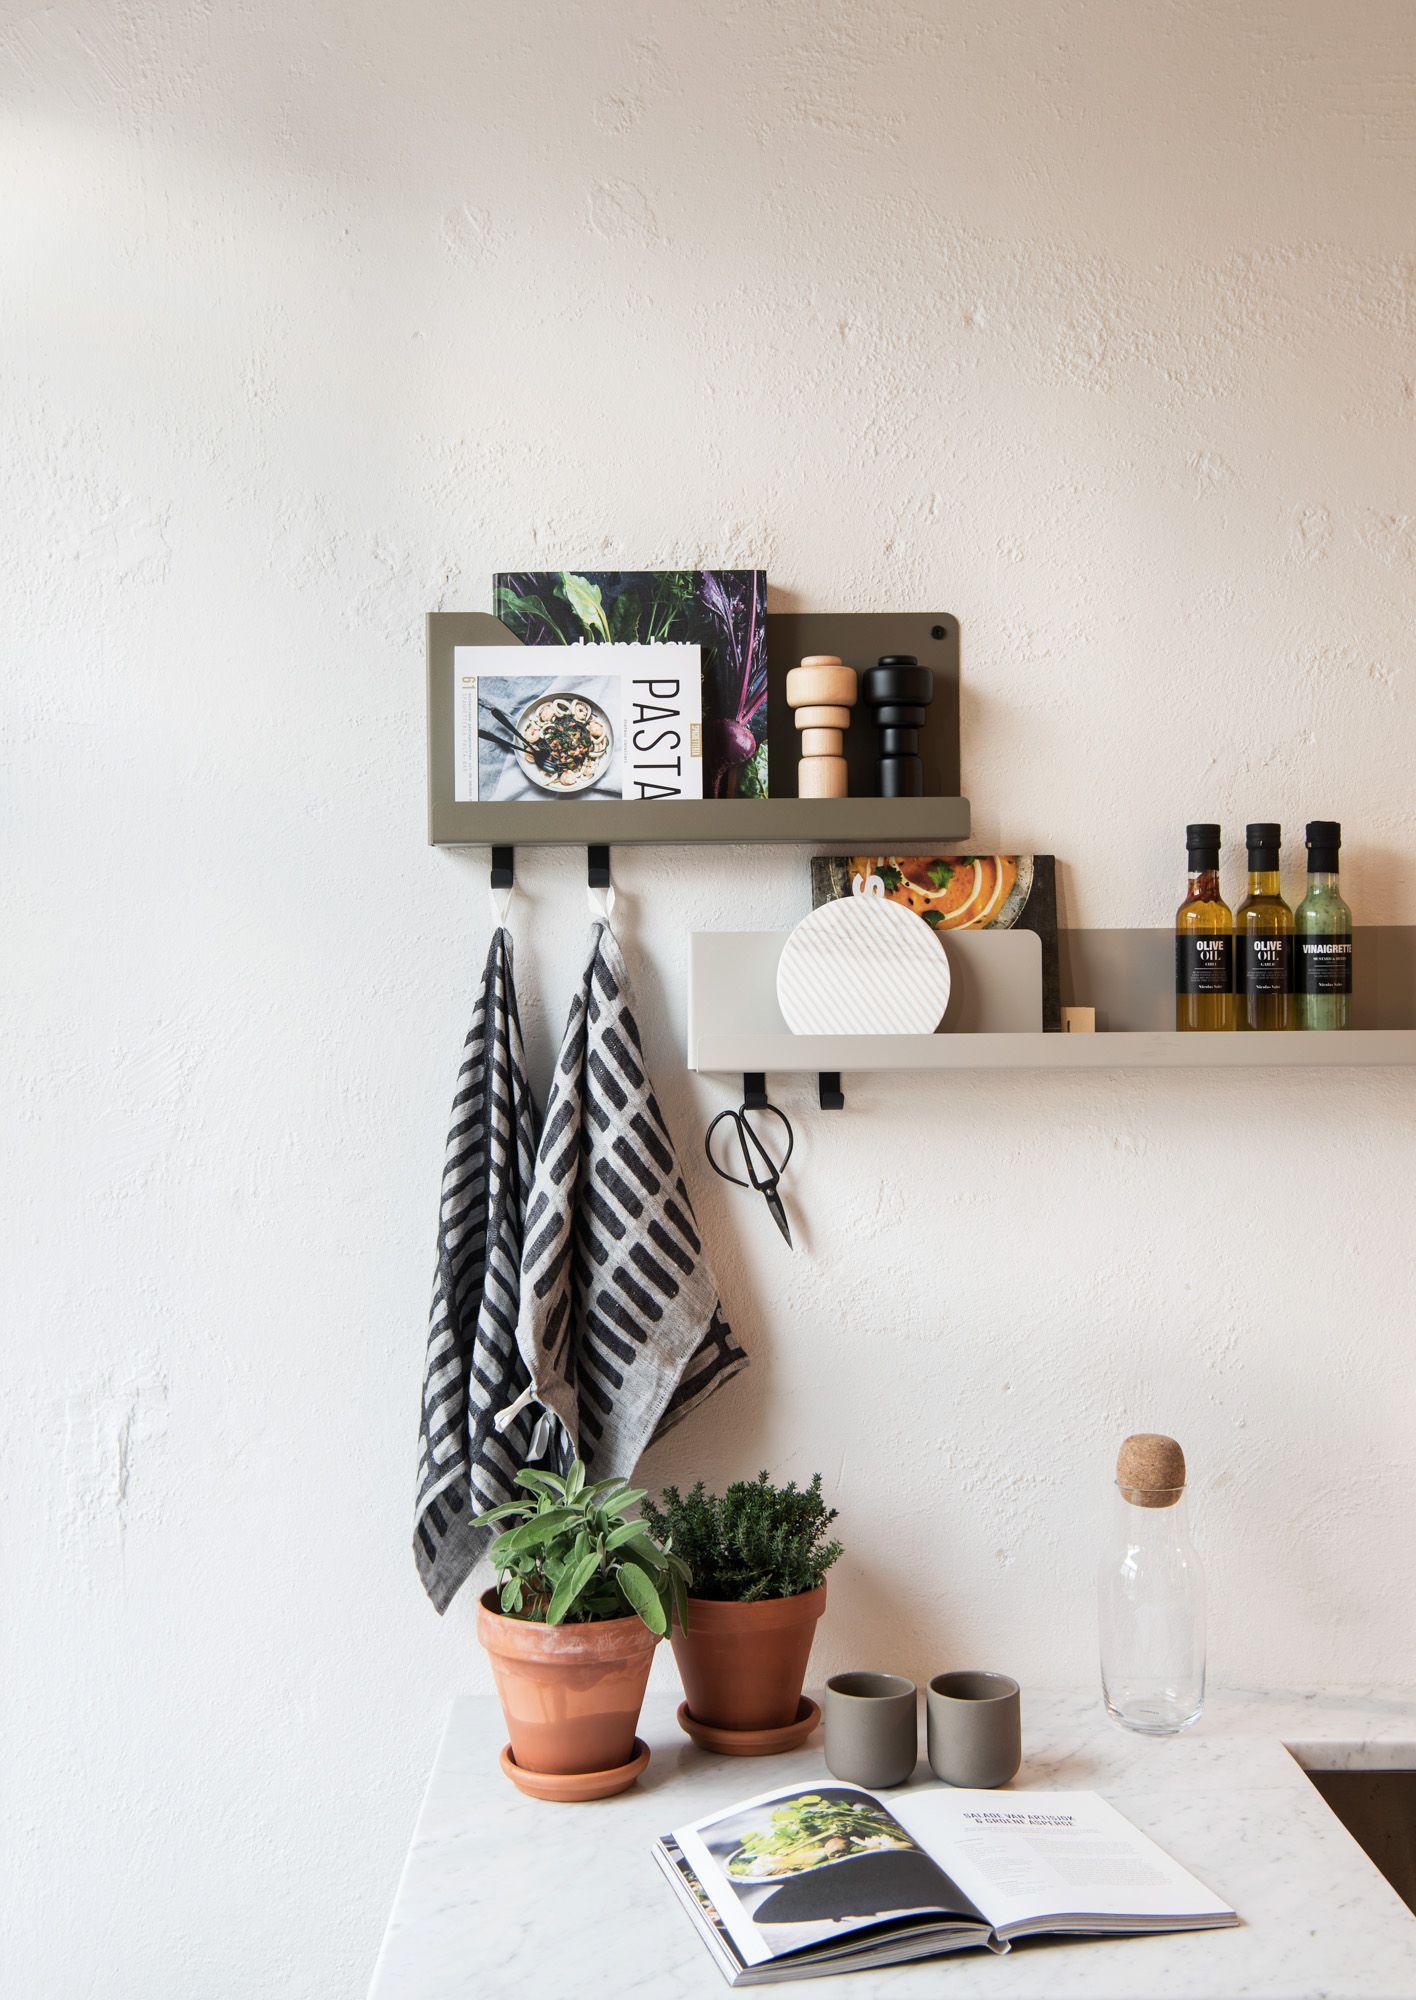 Muuto FOLDED Shelves By Johan Van Hengel At Mobilia Interior In - Salle a manger interiors pour idees de deco de cuisine